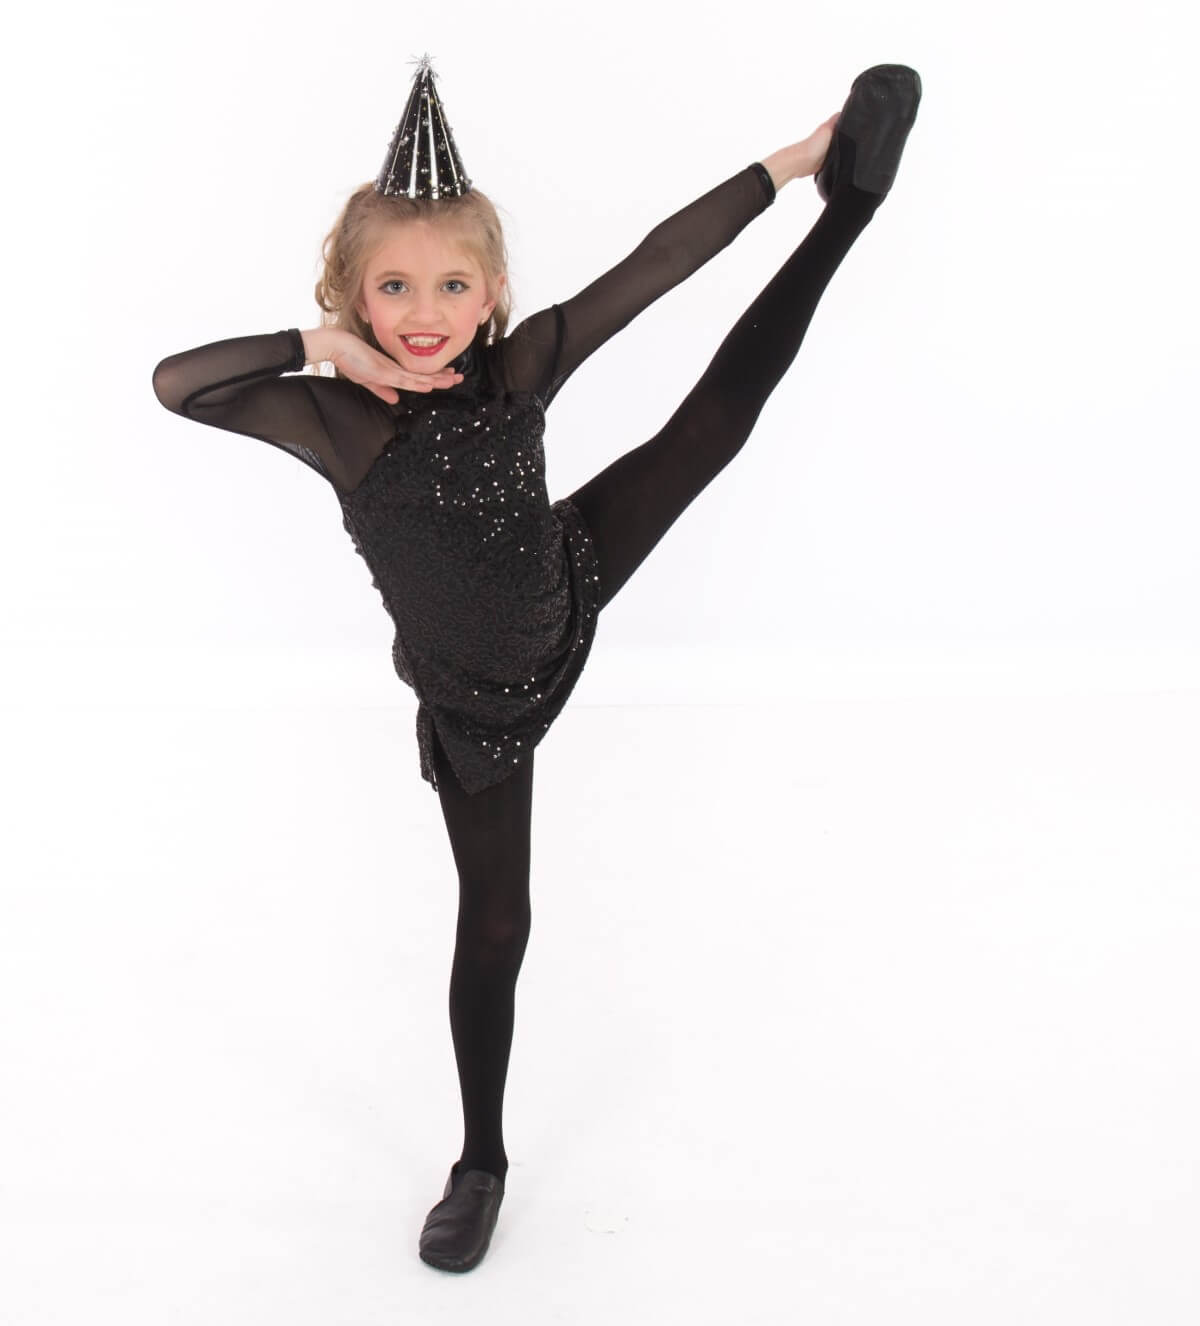 Leg raise pose